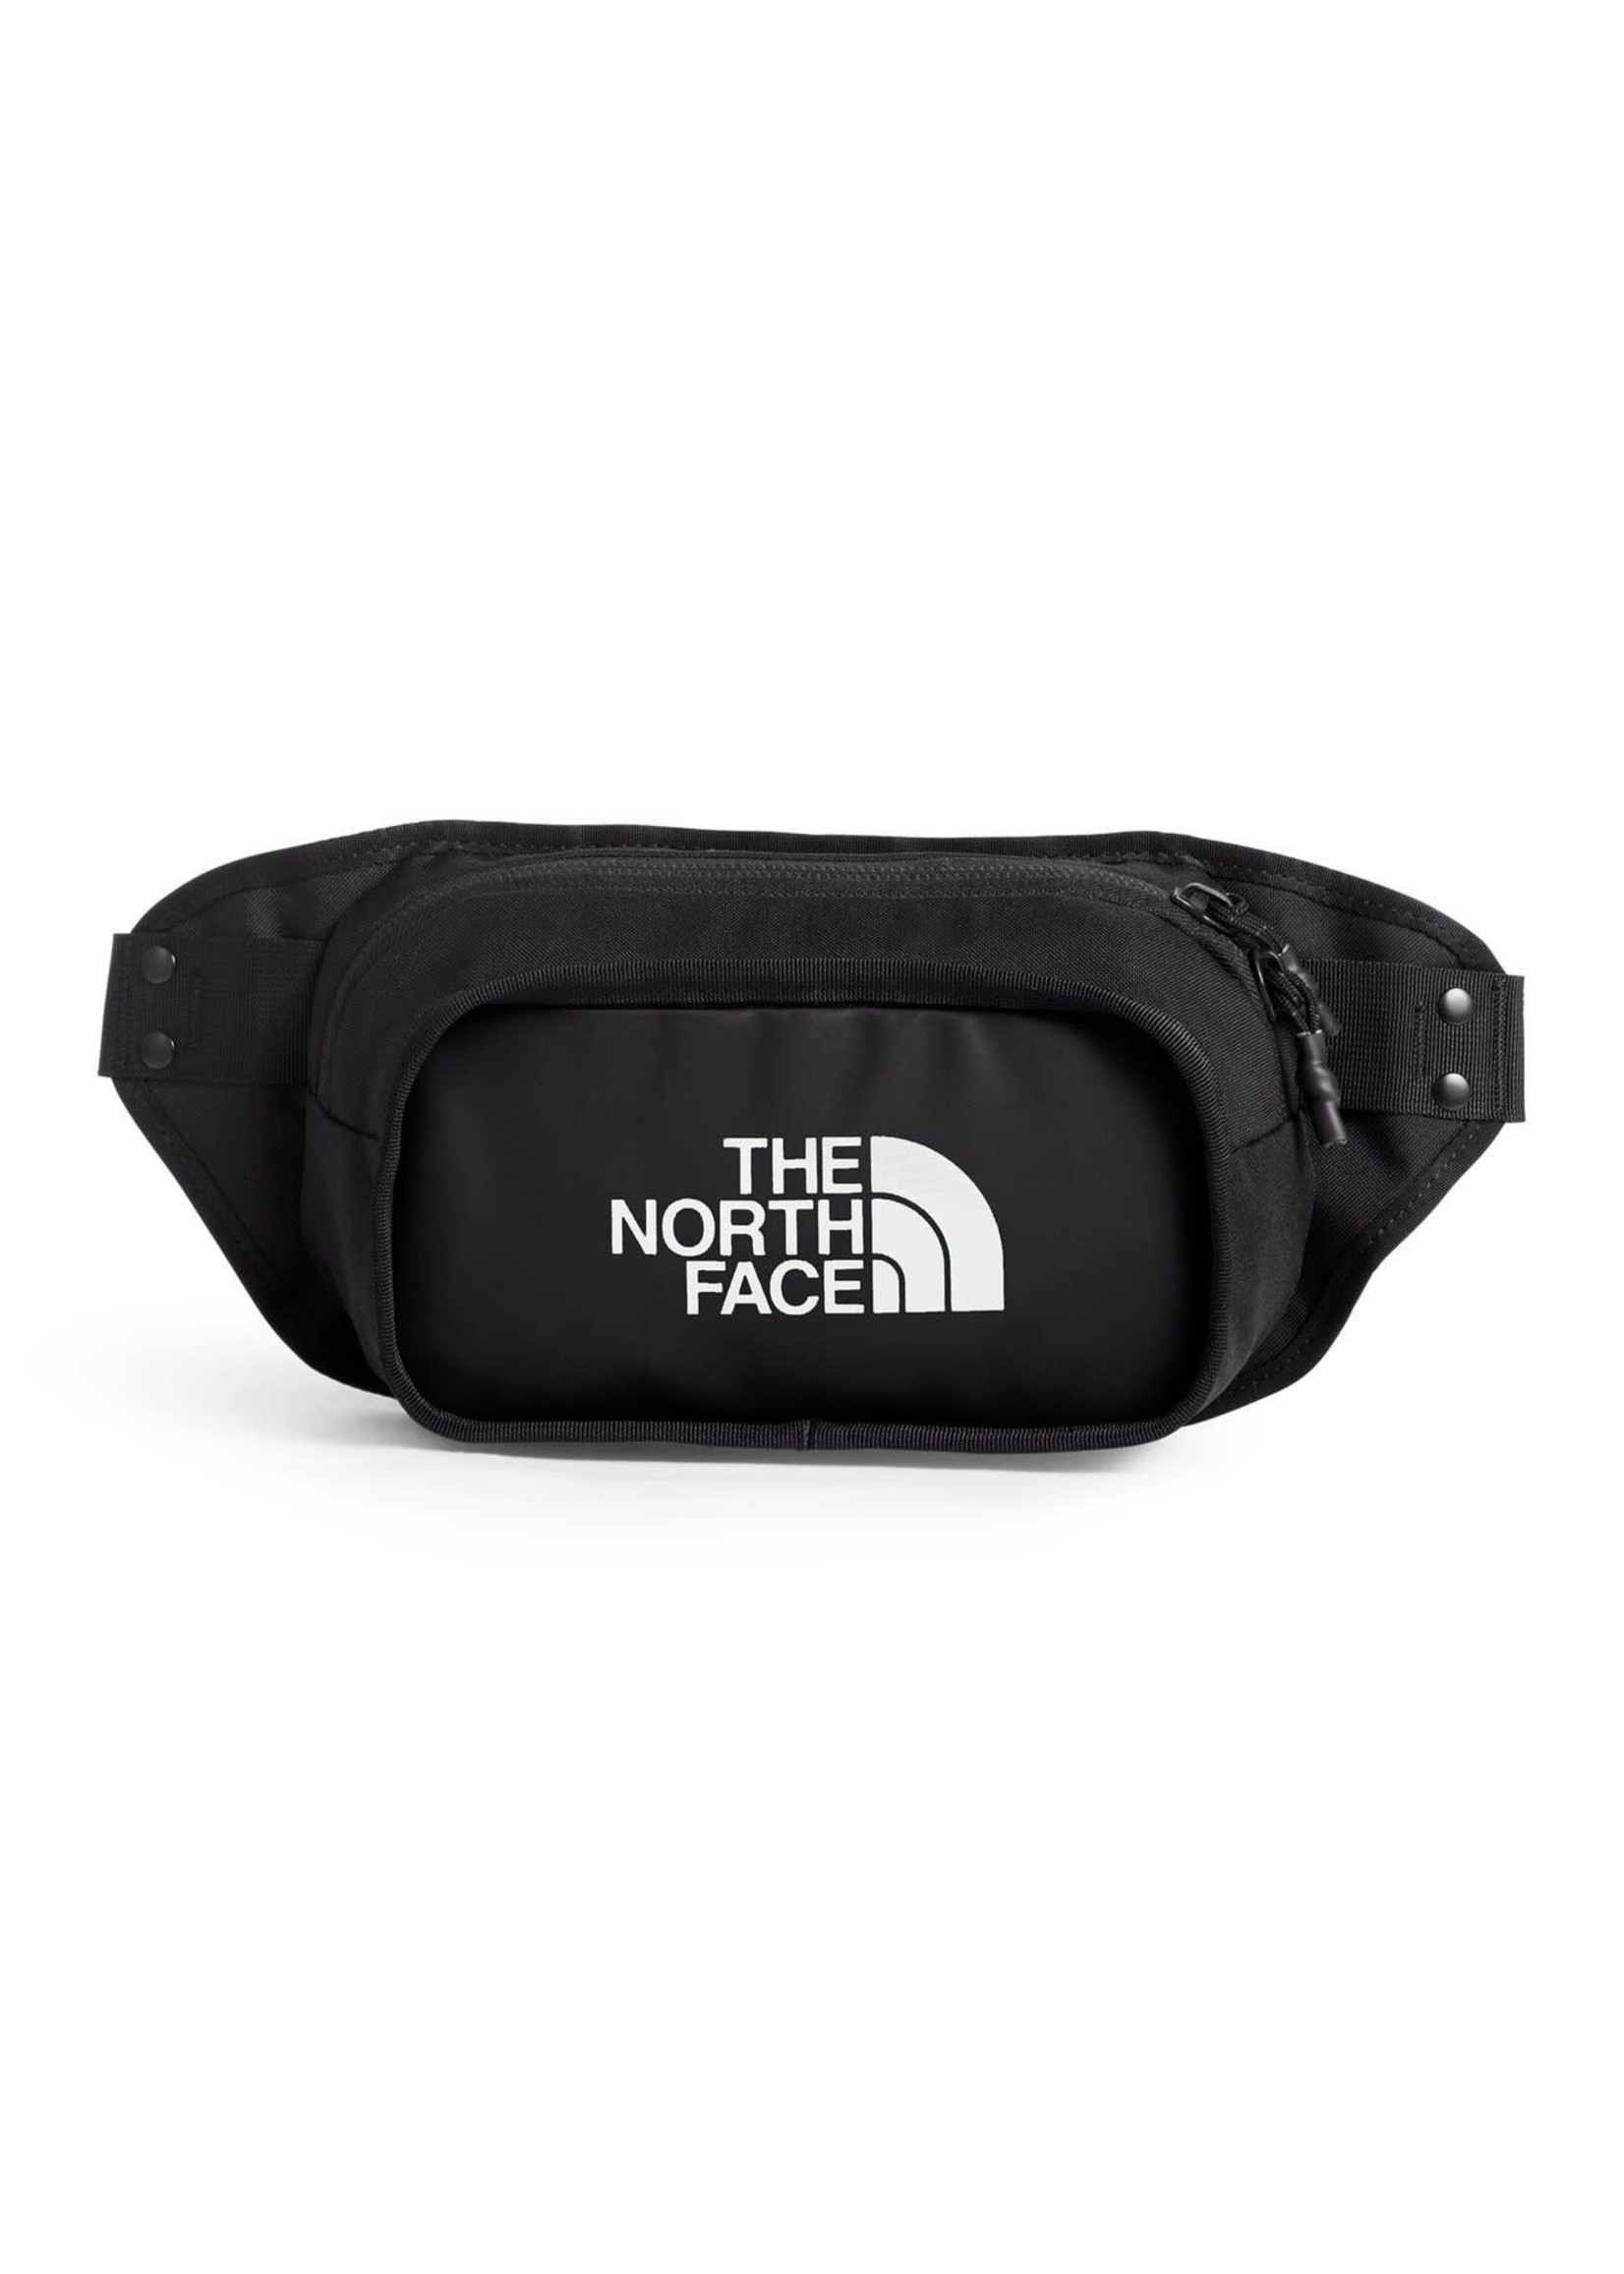 THE NORTH FACE Sac de taille Explore